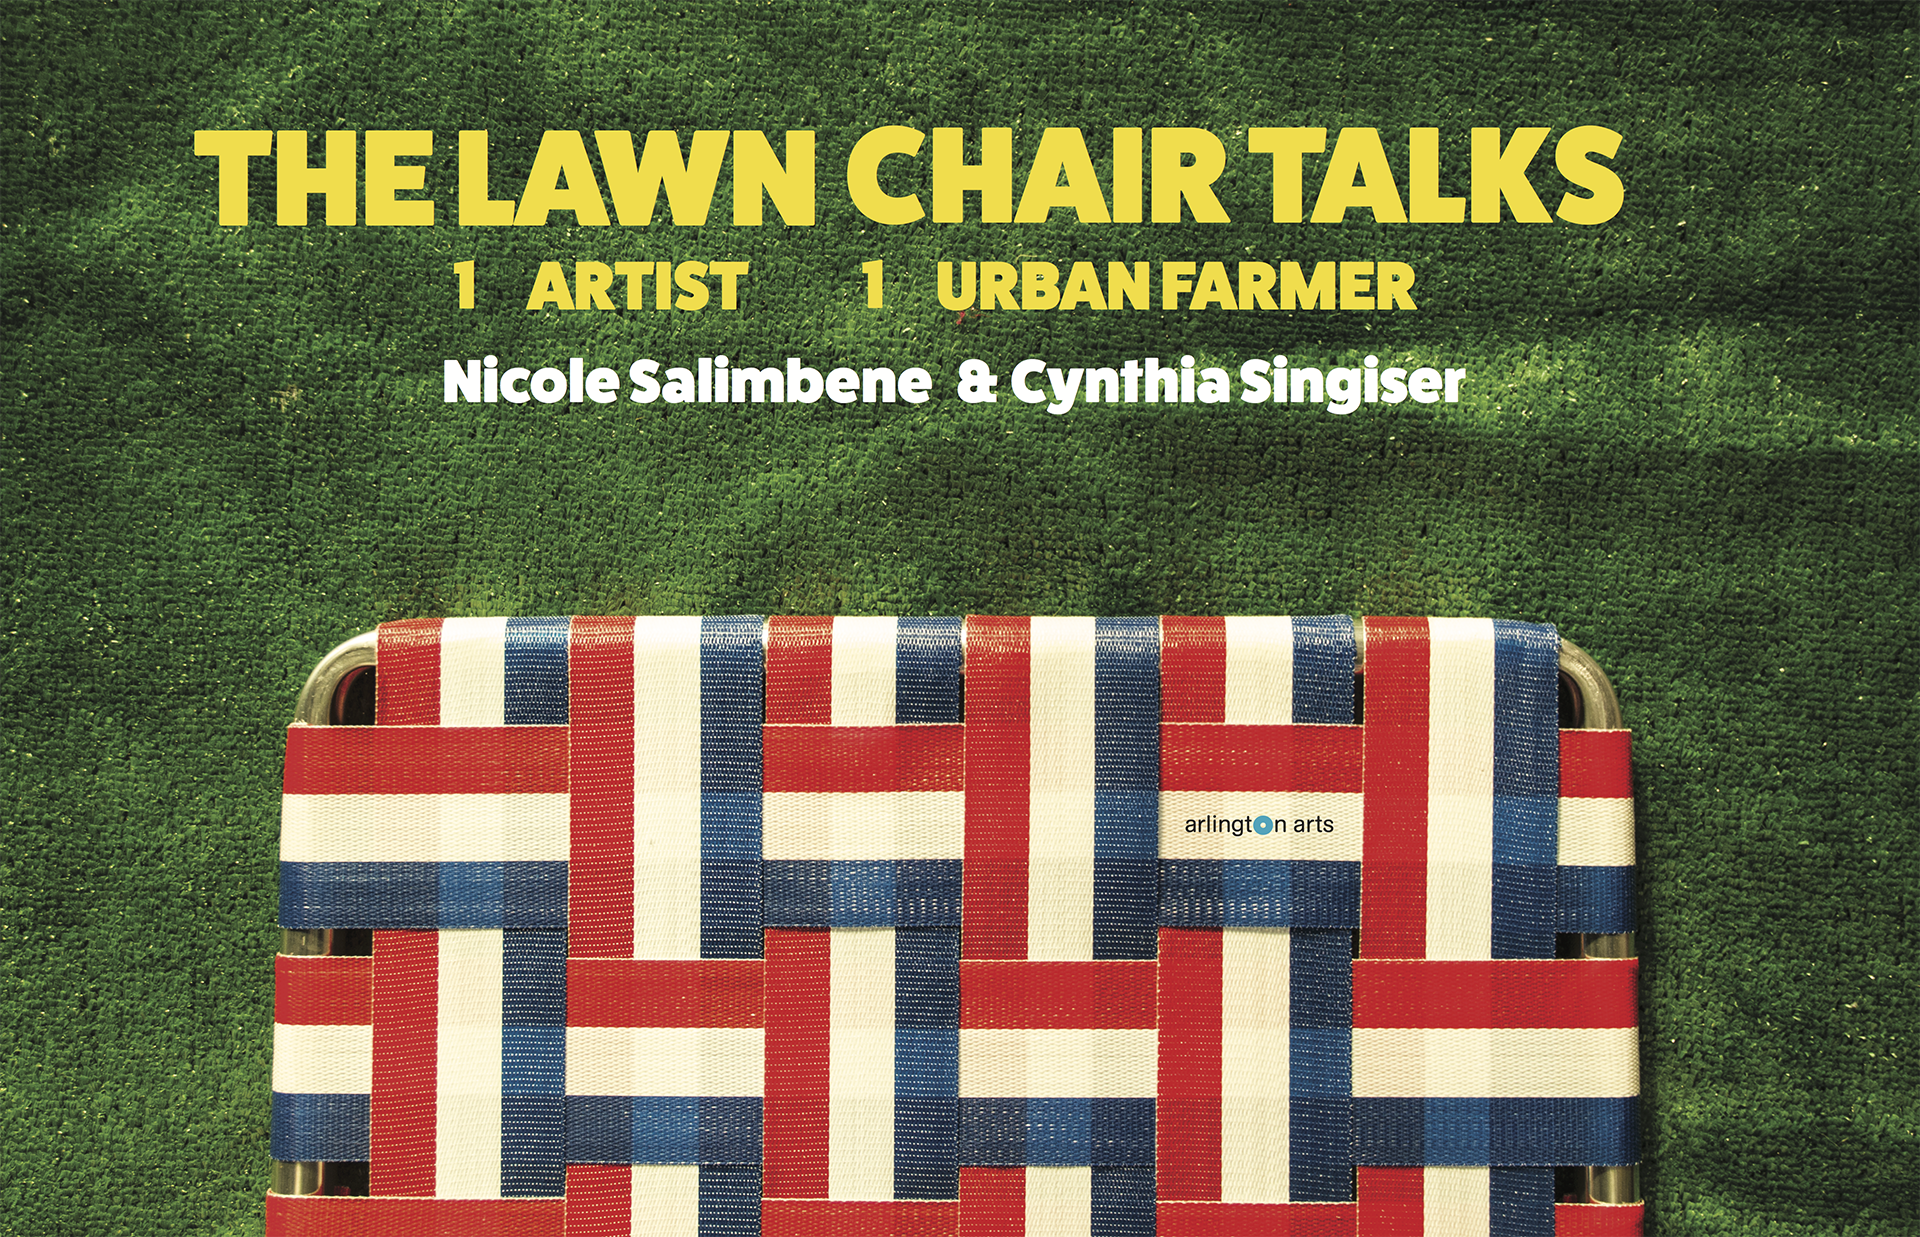 Lawn_Chair_Talks_november copy.png